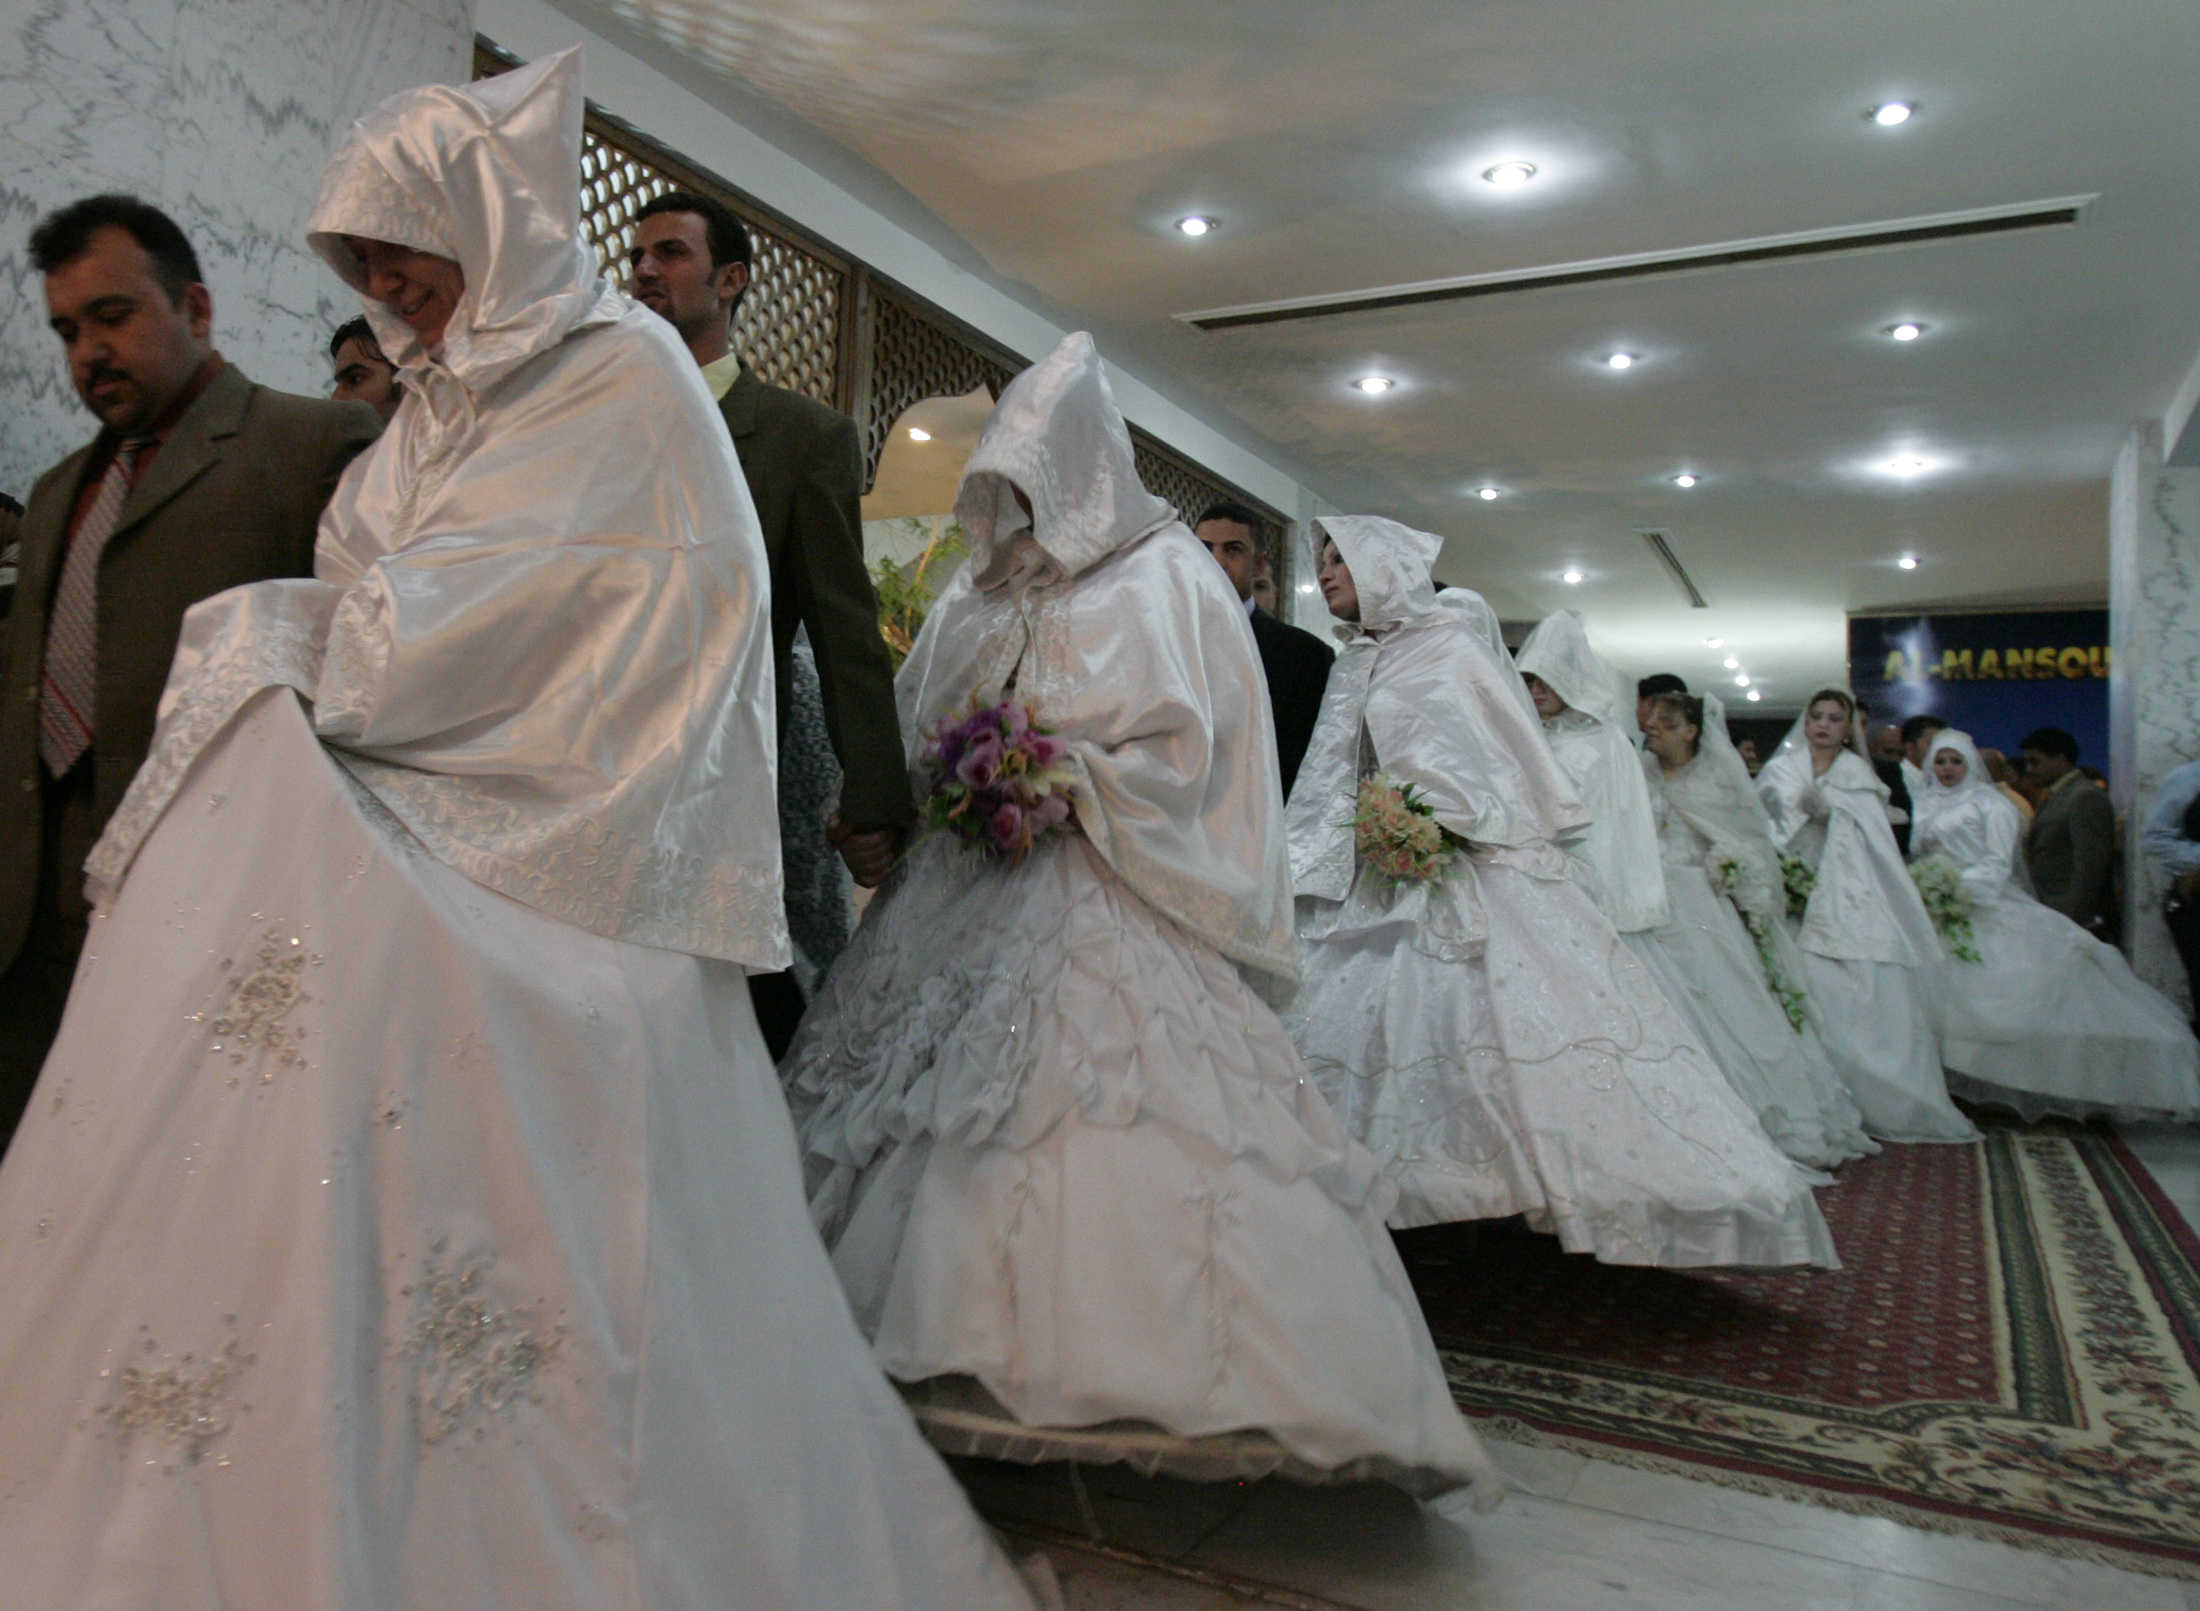 BYEFELECIA - For those who wish to combine two women .. An Iraqi bank gives a loan for the second marriage 2008-06-06T120000Z_66729365_GM1E4661DGW01_RTRMADP_3_IRAQ.JPG?itok=bQBUXDu7&_ga=2.60982188.1825819059.1603212282-2038761289